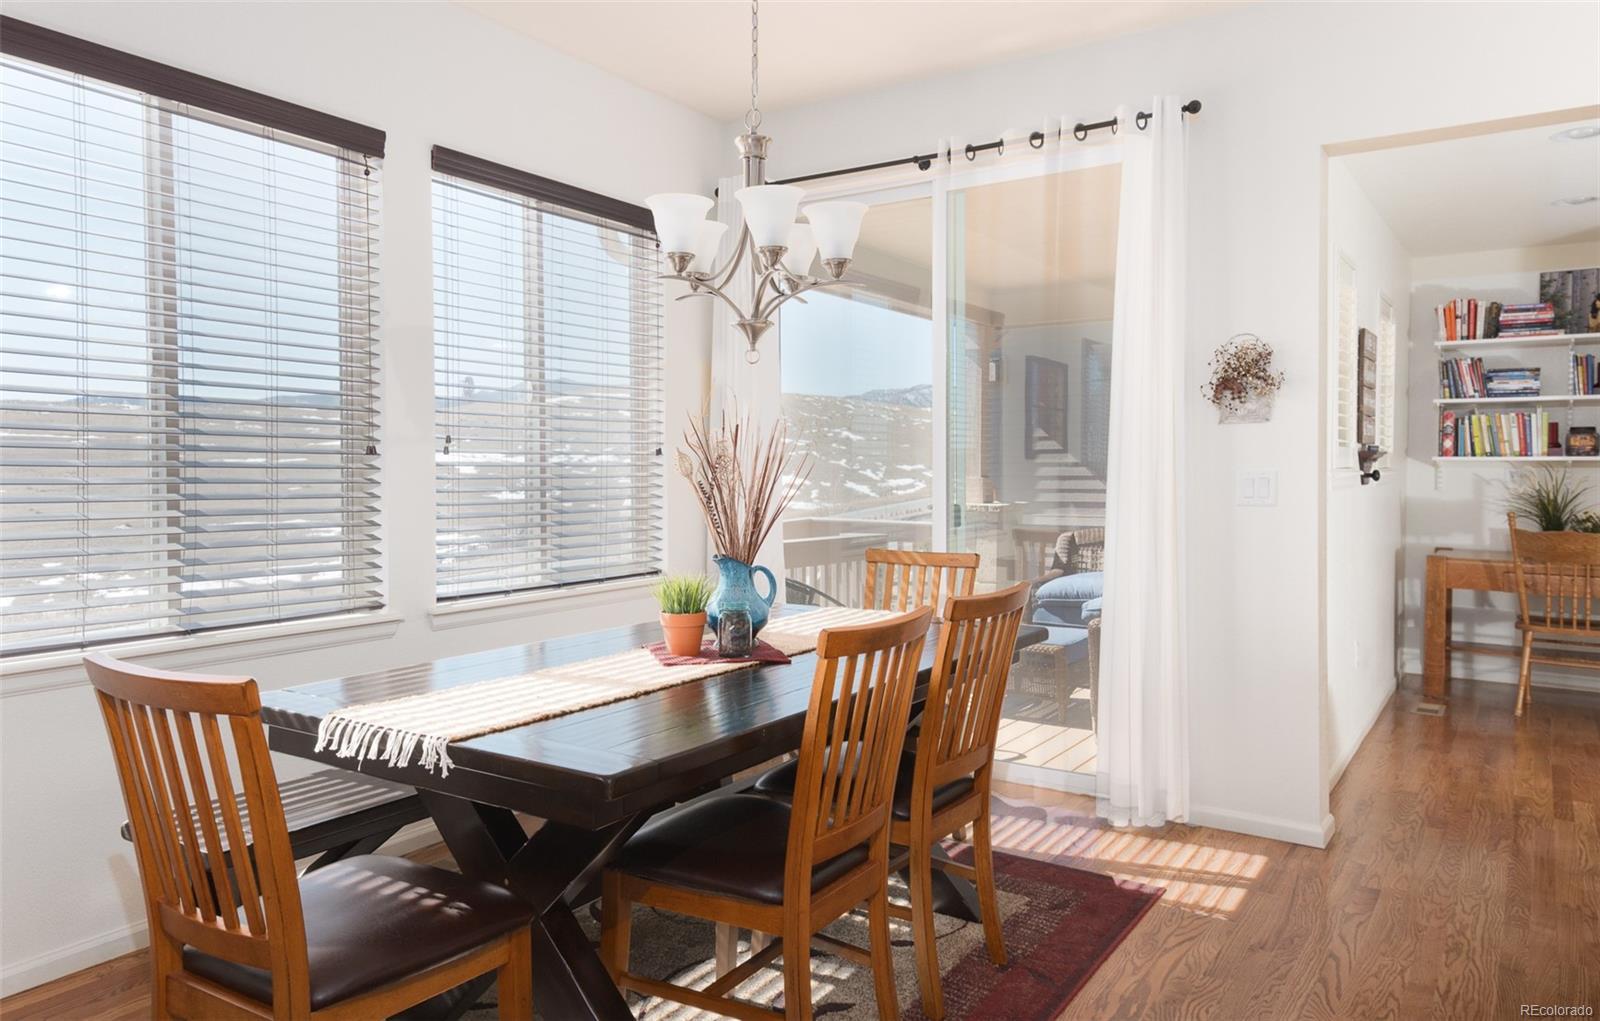 Breakfast/Dining area adjacent to kitchen